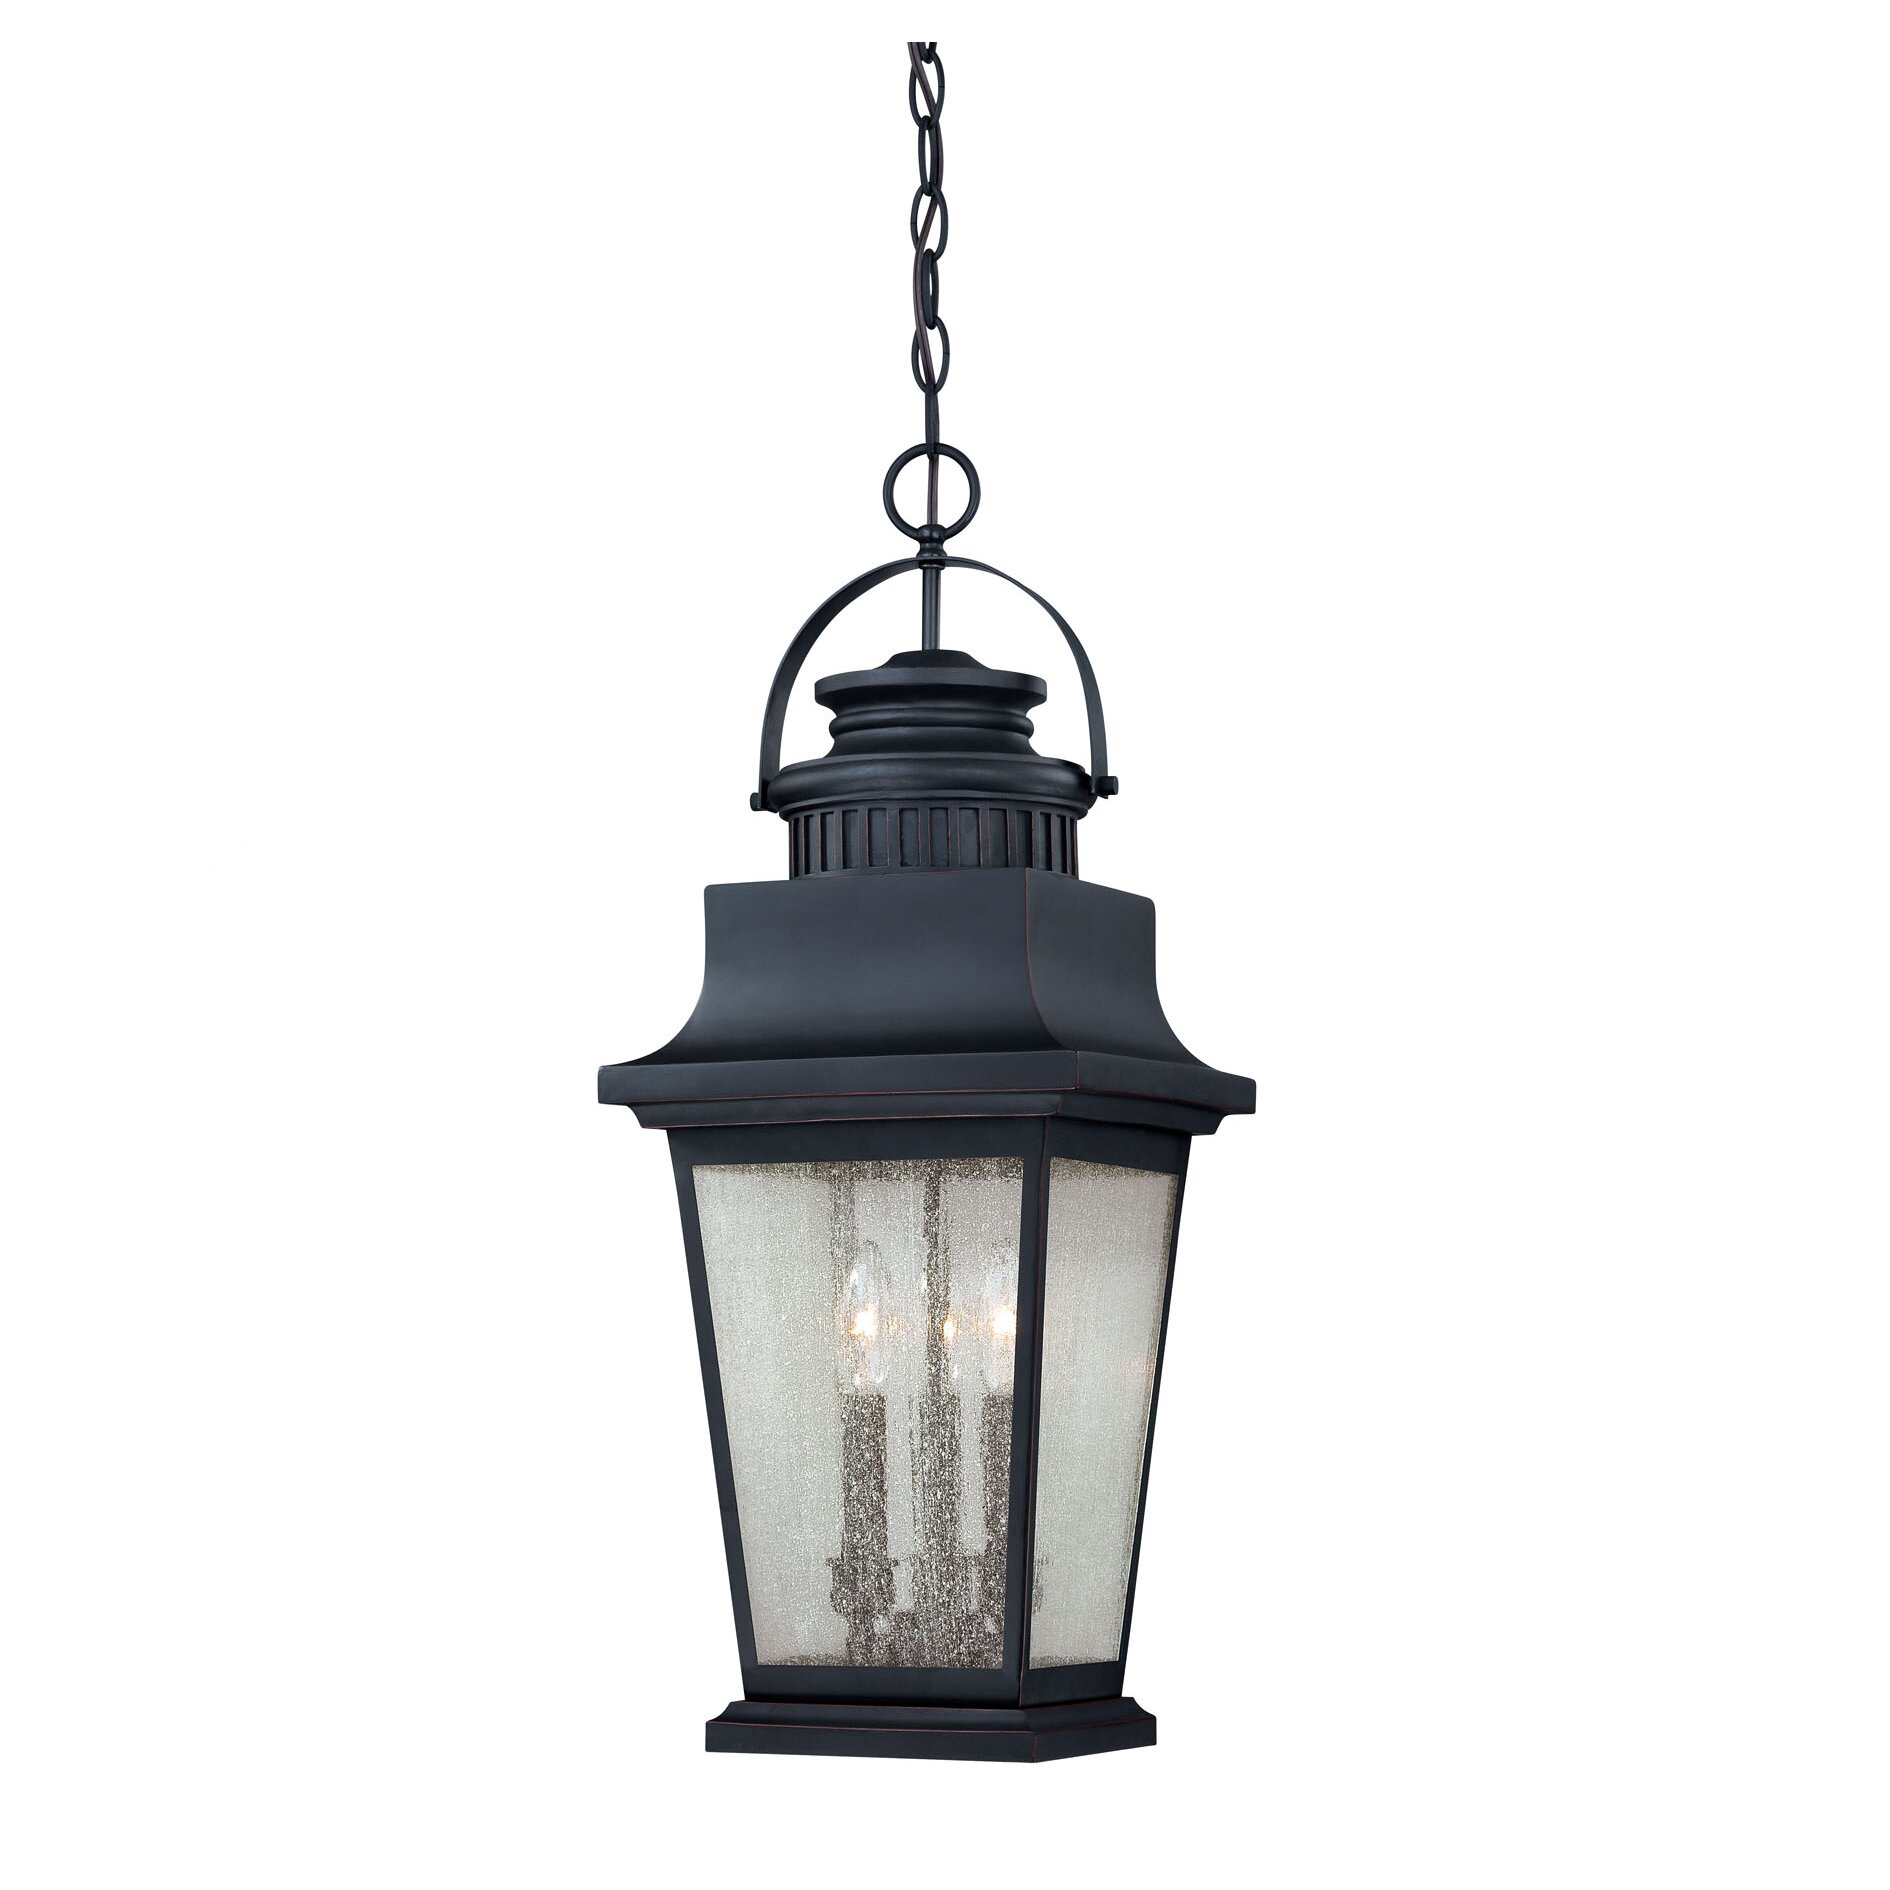 Wayfair Outdoor Hanging Lights: Barrister 3 Light Outdoor Hanging Lantern